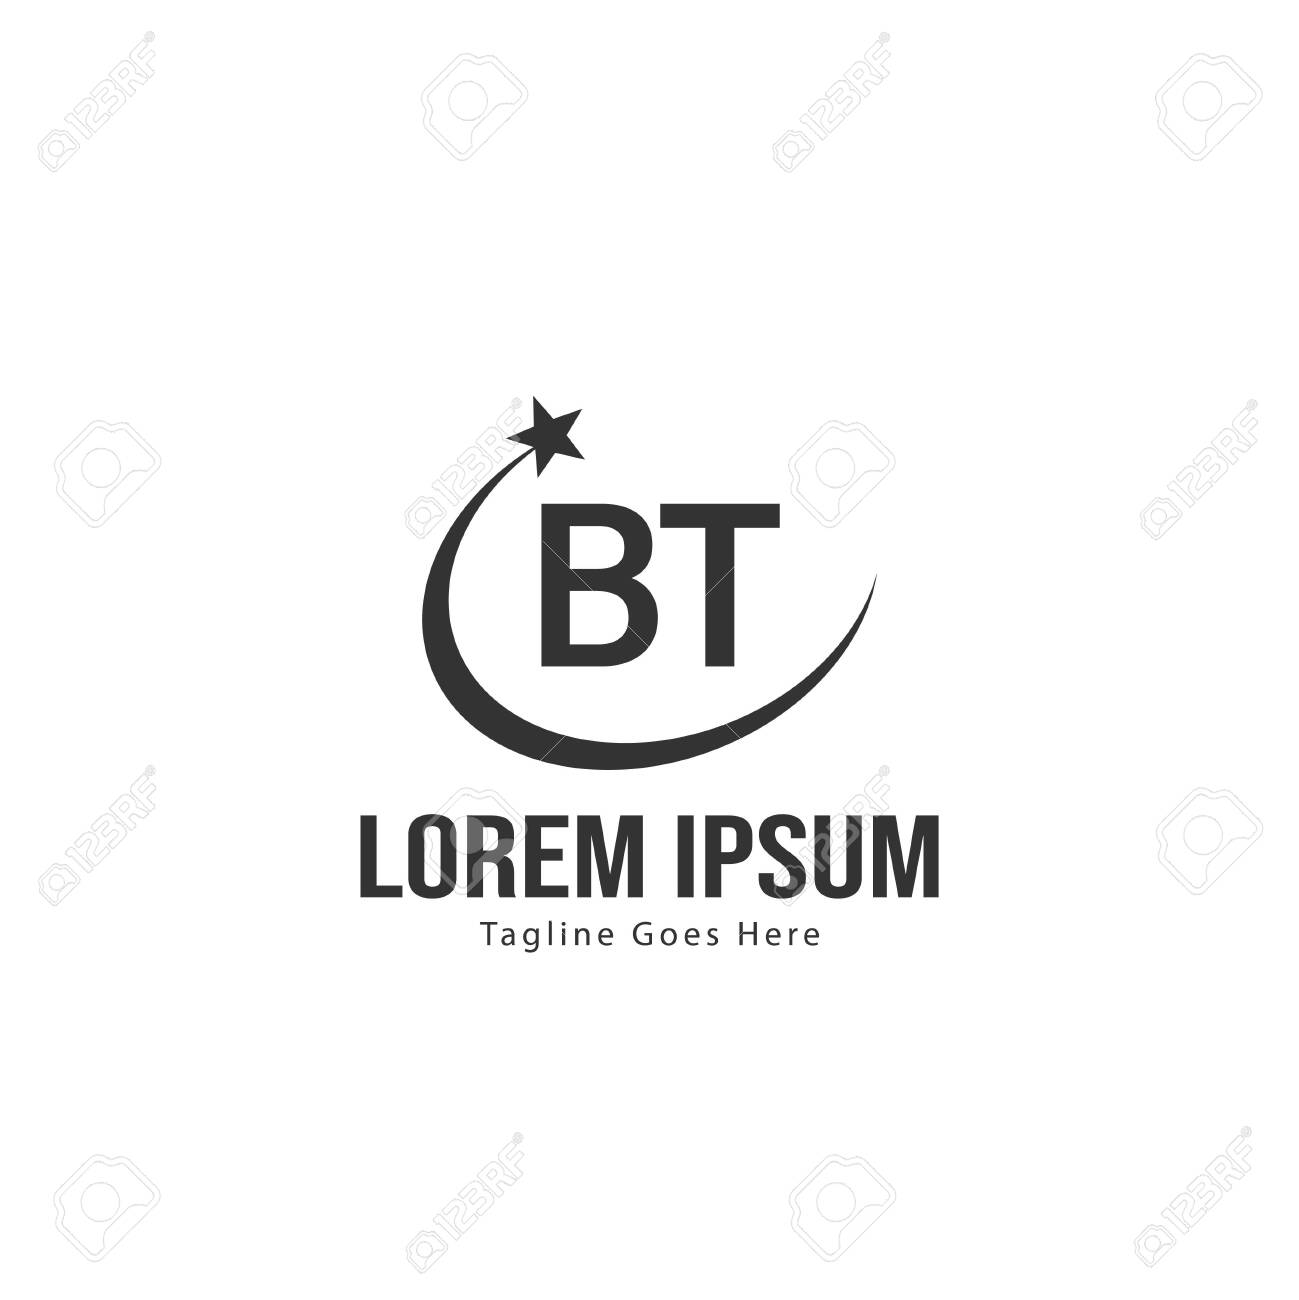 BT Letter Logo Design. Creative Modern BT Letters Icon Illustration - 129369134